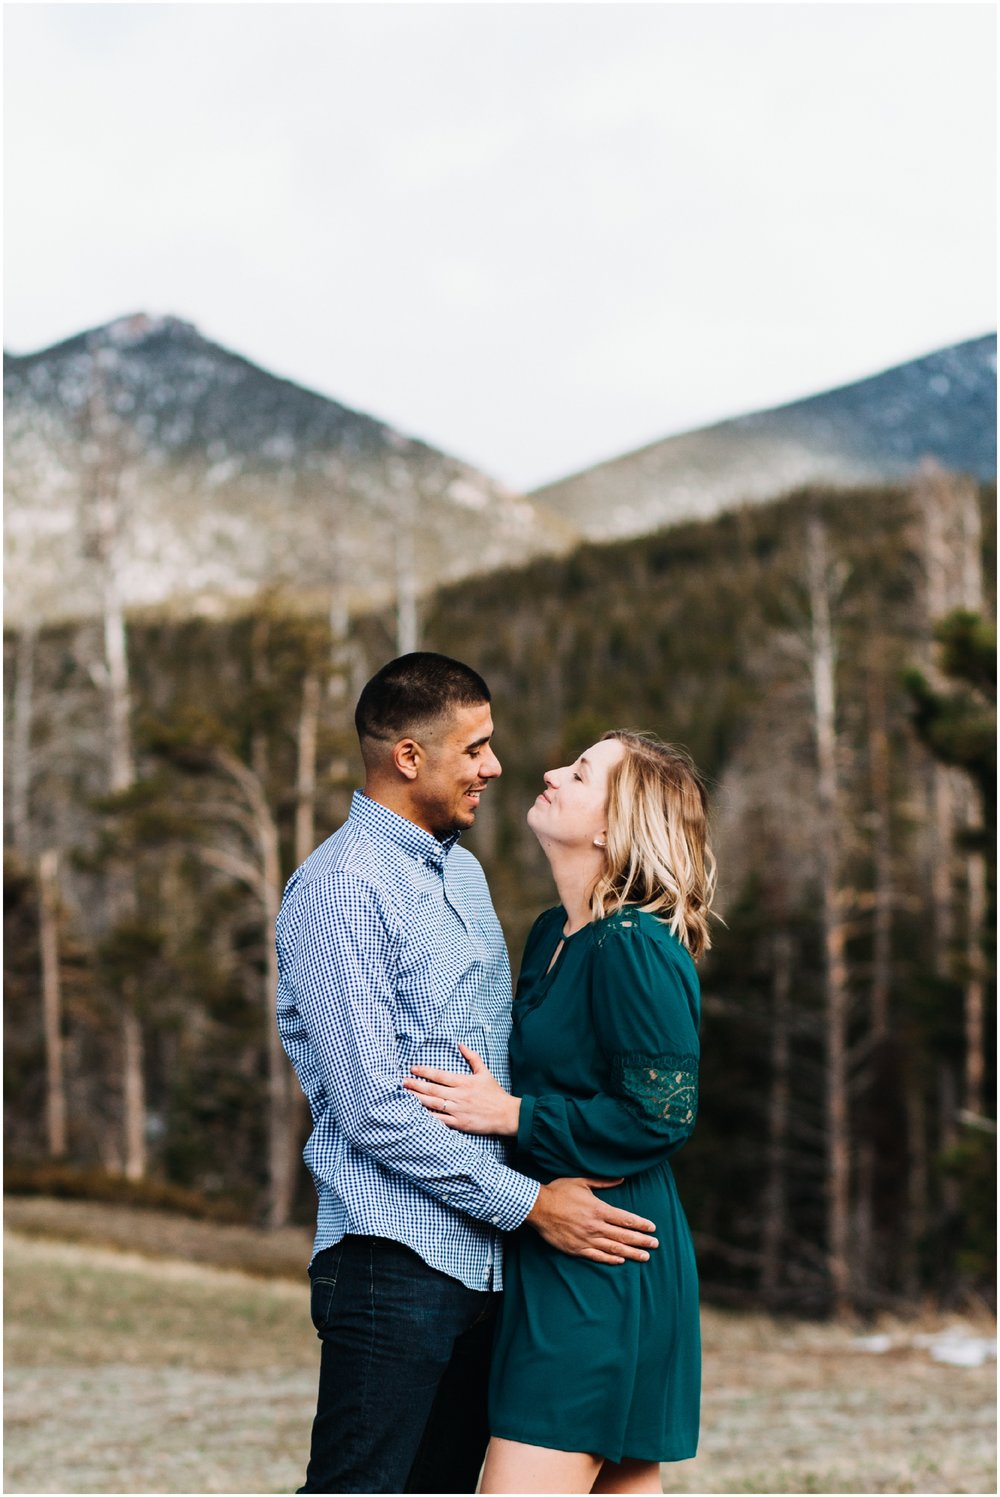 rocky-mountain-national-park-elopement-sprague-lake-colorado-adventure-wedding-photographer_taylor-powers_119.jpg